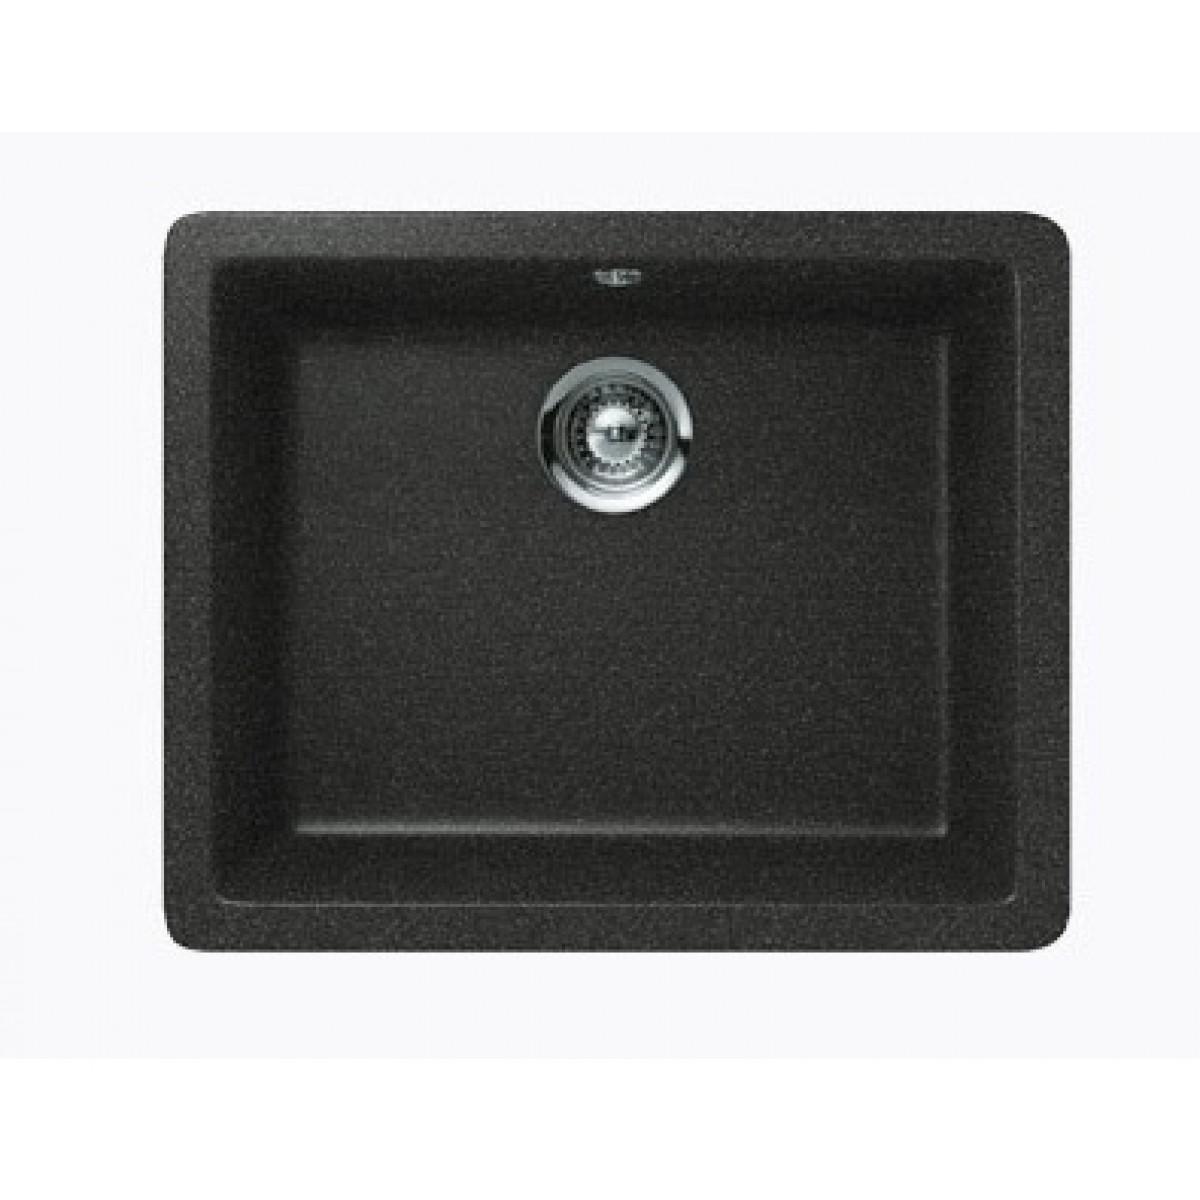 Black Quartz Composite Single Bowl Undermount / Drop In Kitchen Sink ...